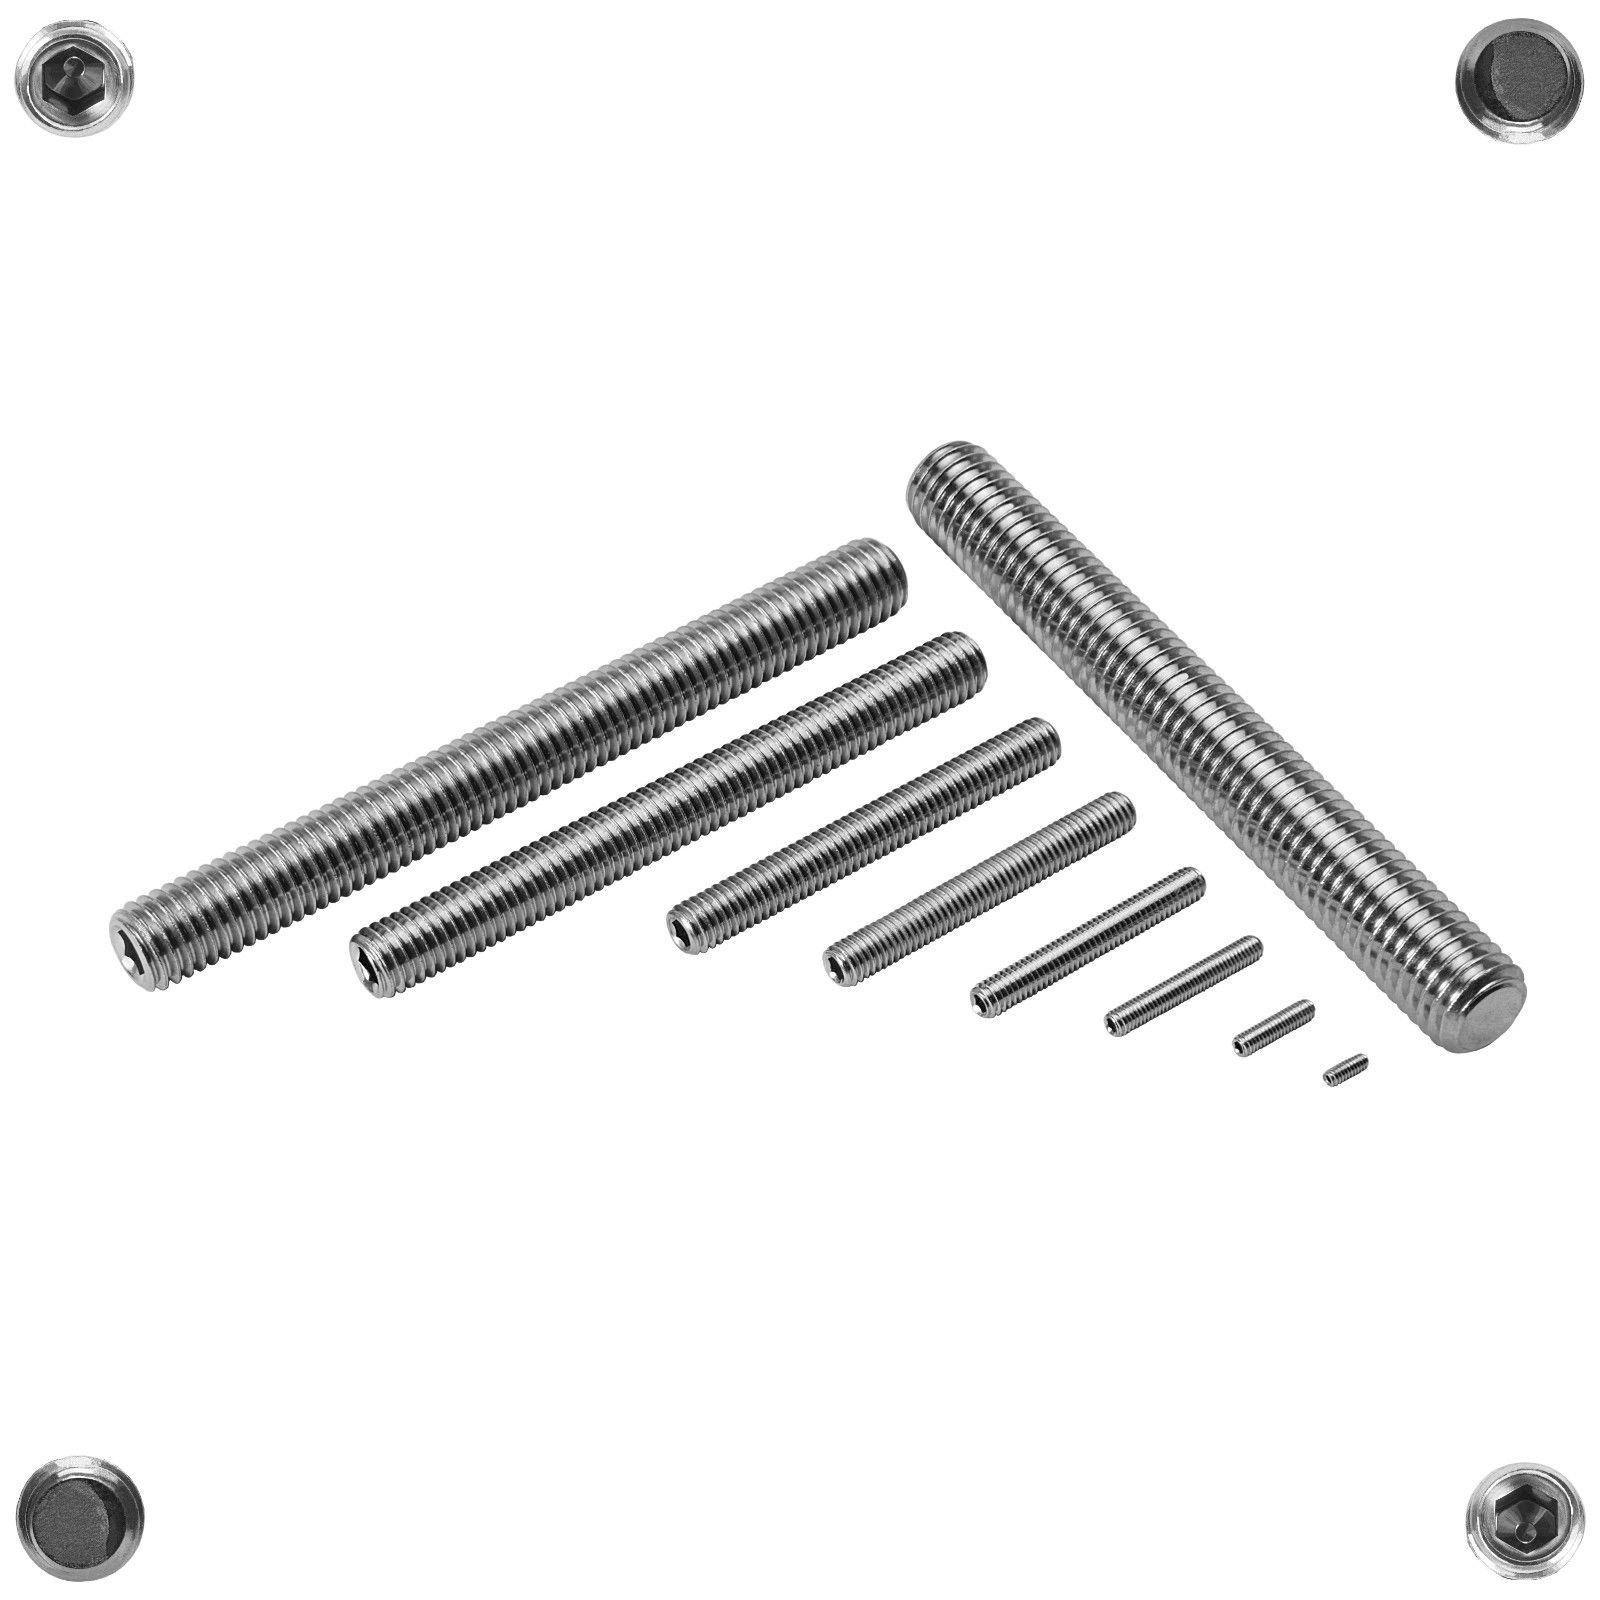 50 St/ück 3,5 x 60 mm Blechschrauben DIN 7981 ISO 14585 TORX Edelstahl A2 VA V2A Linsenkopf